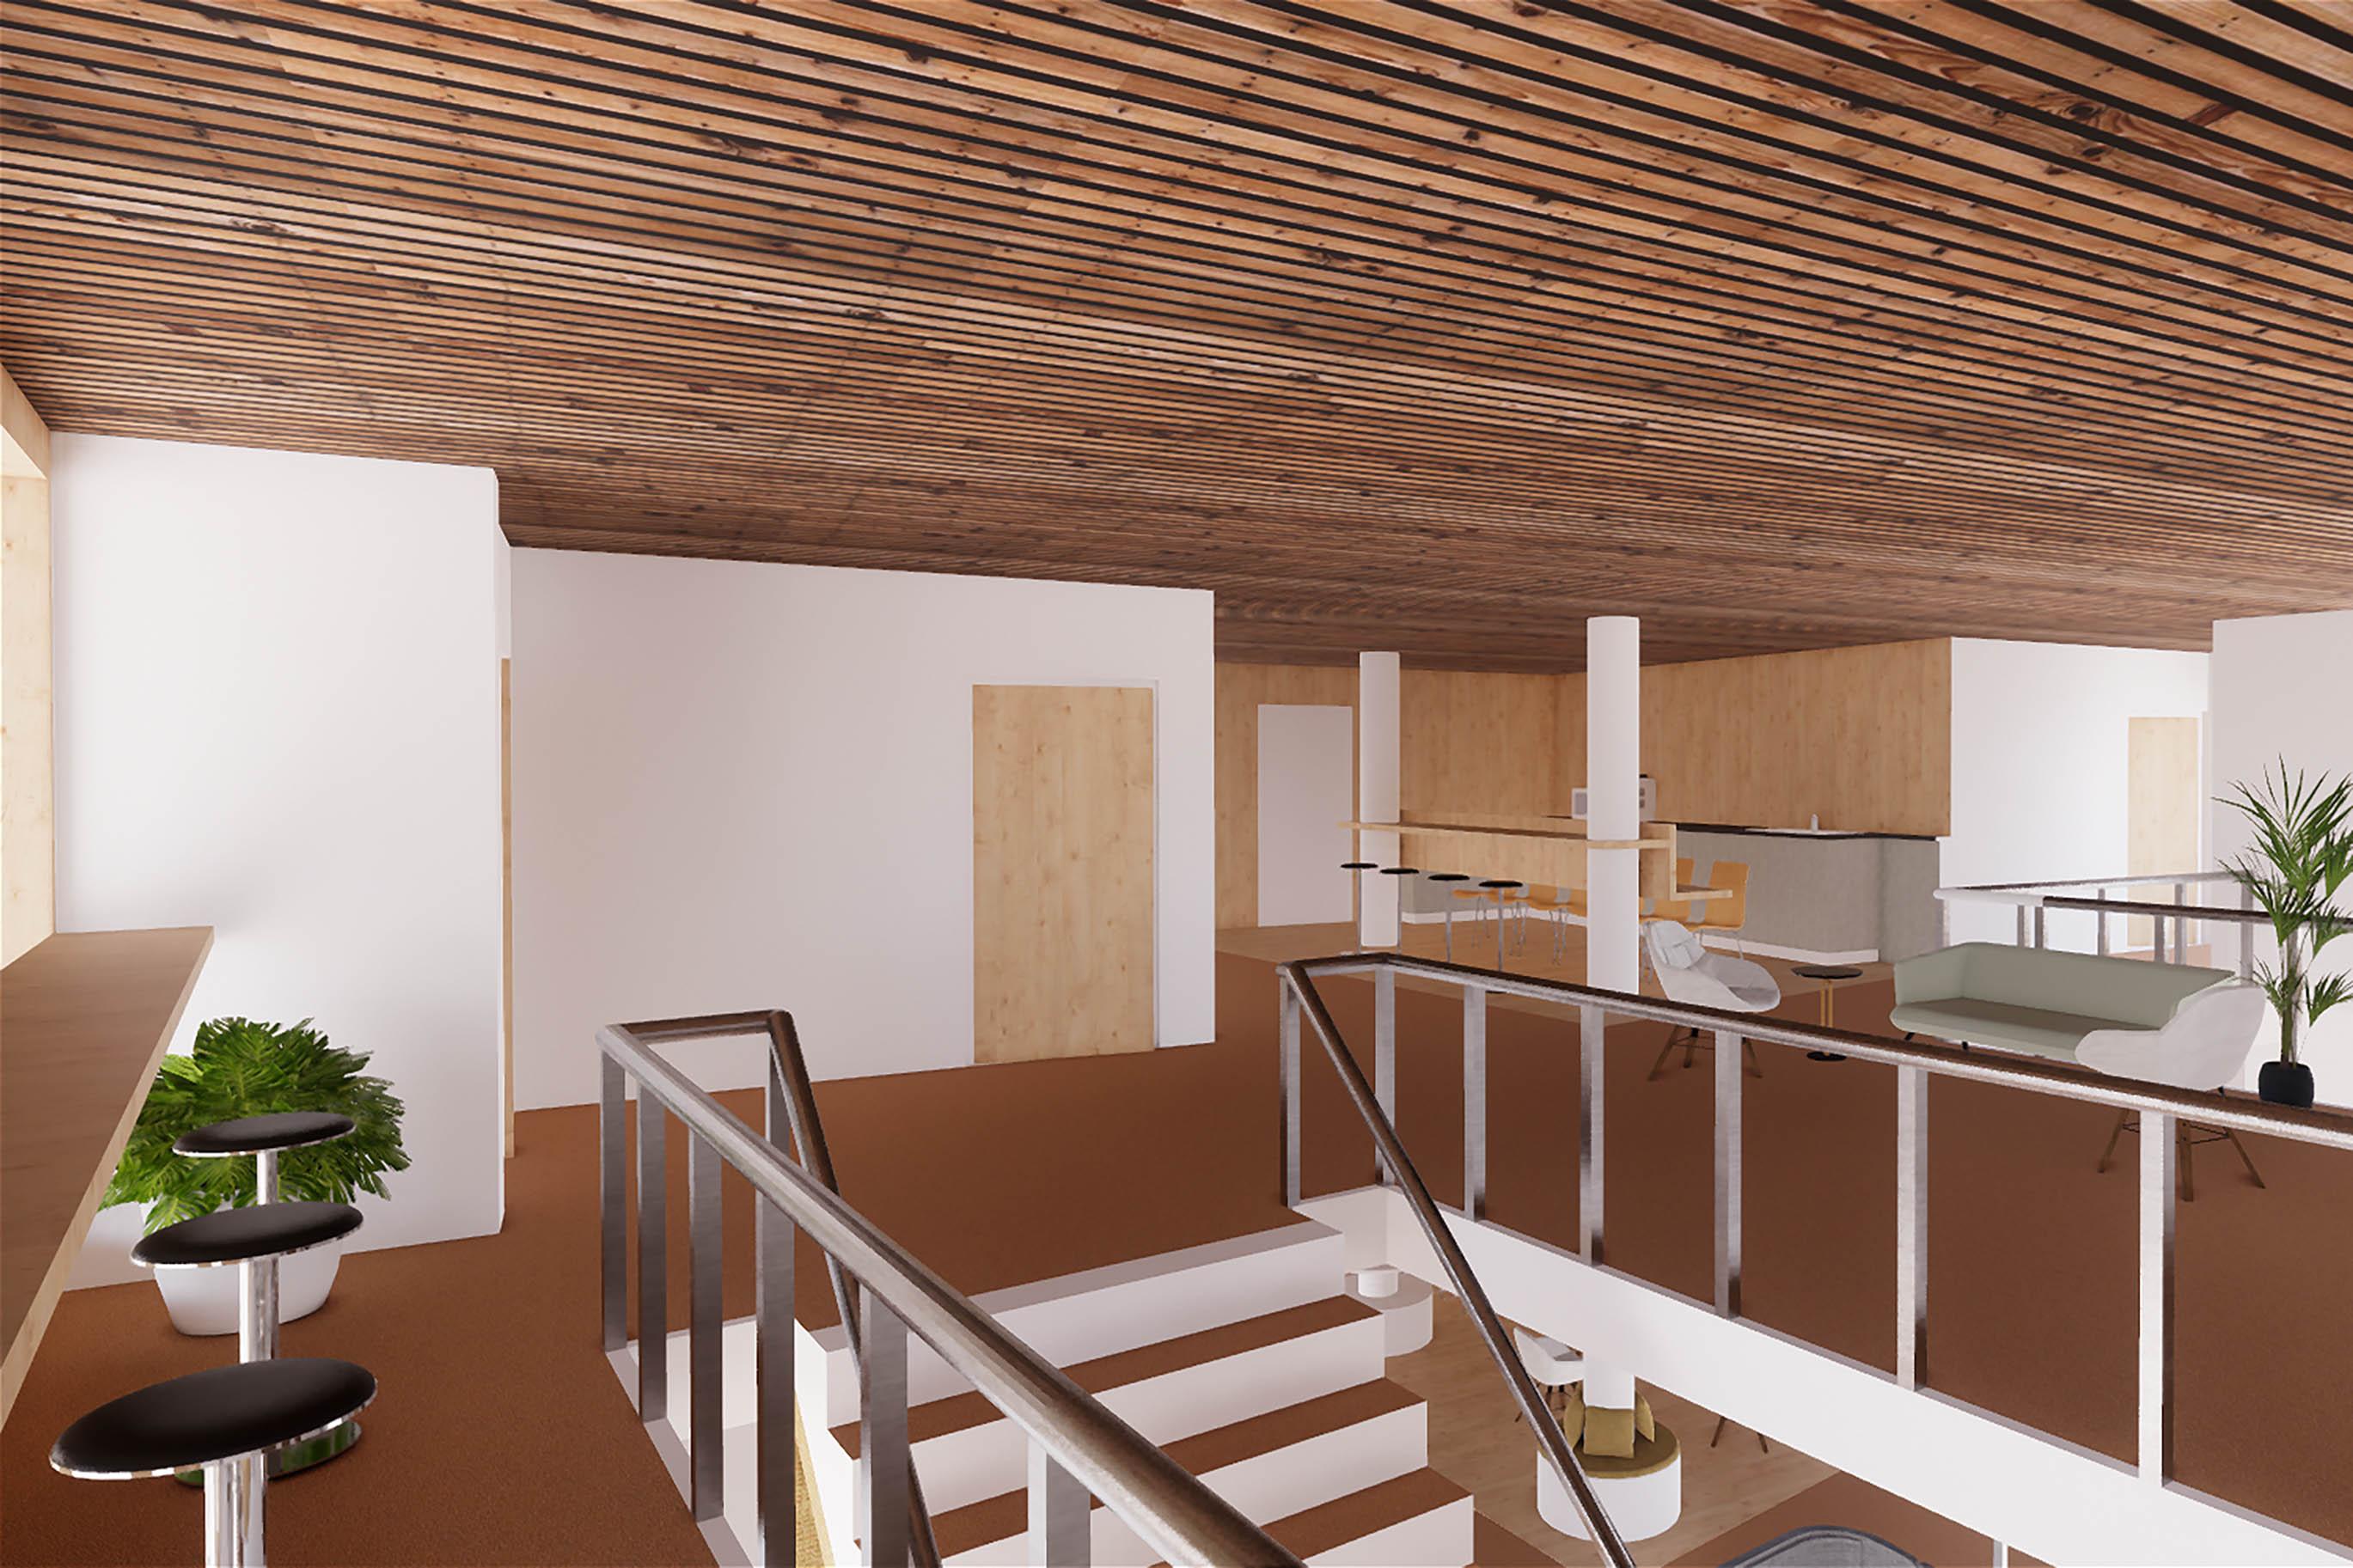 2738x1825 Triodos Bank Netherlands Akka Architects Workplace Design